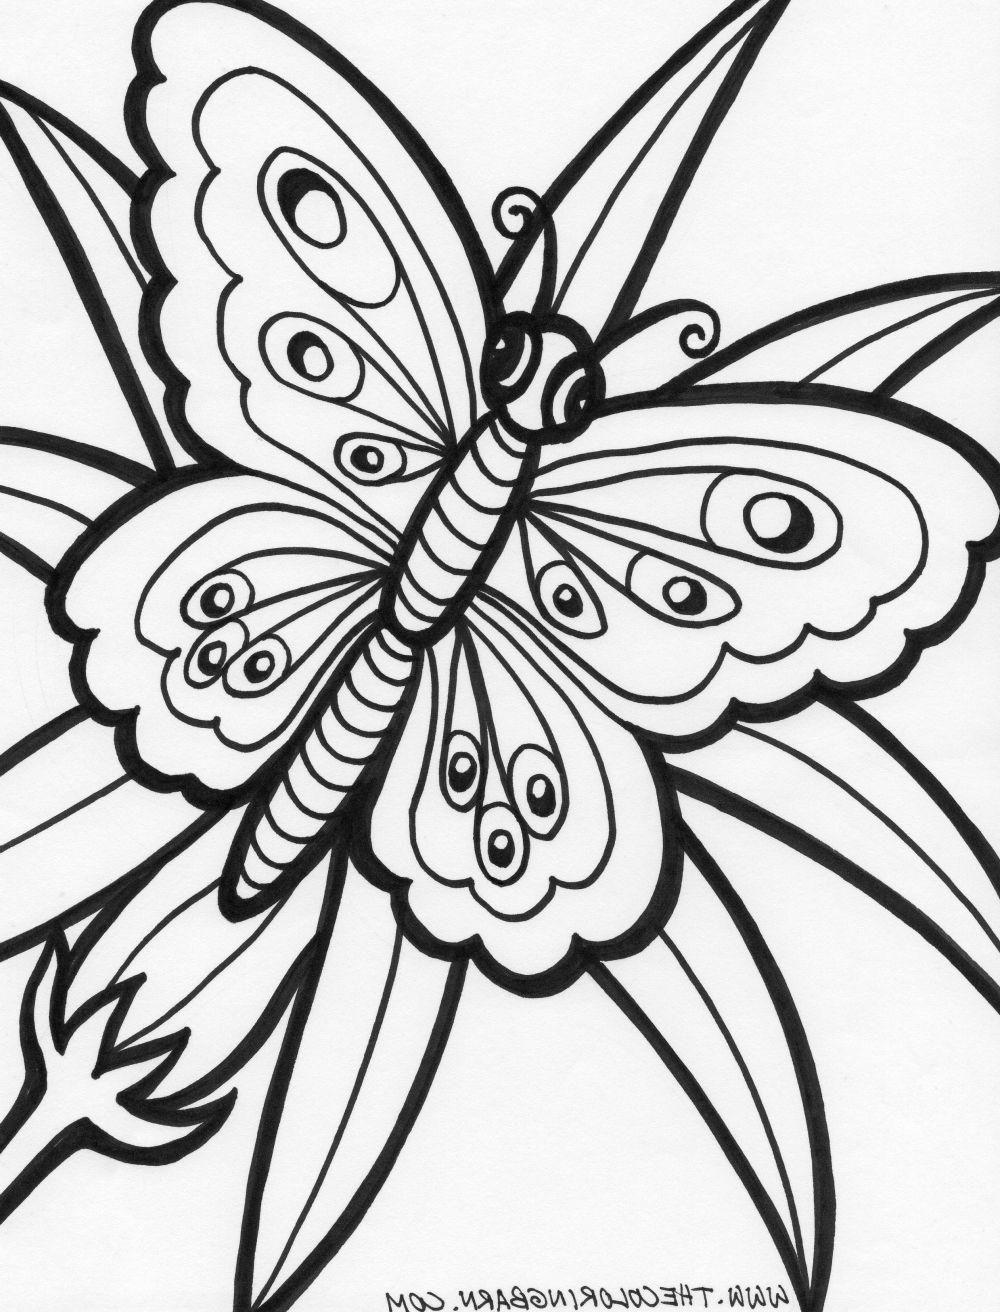 Free Printable Tattoo Designs | Printable Heart Dragon Tattoo Design ...